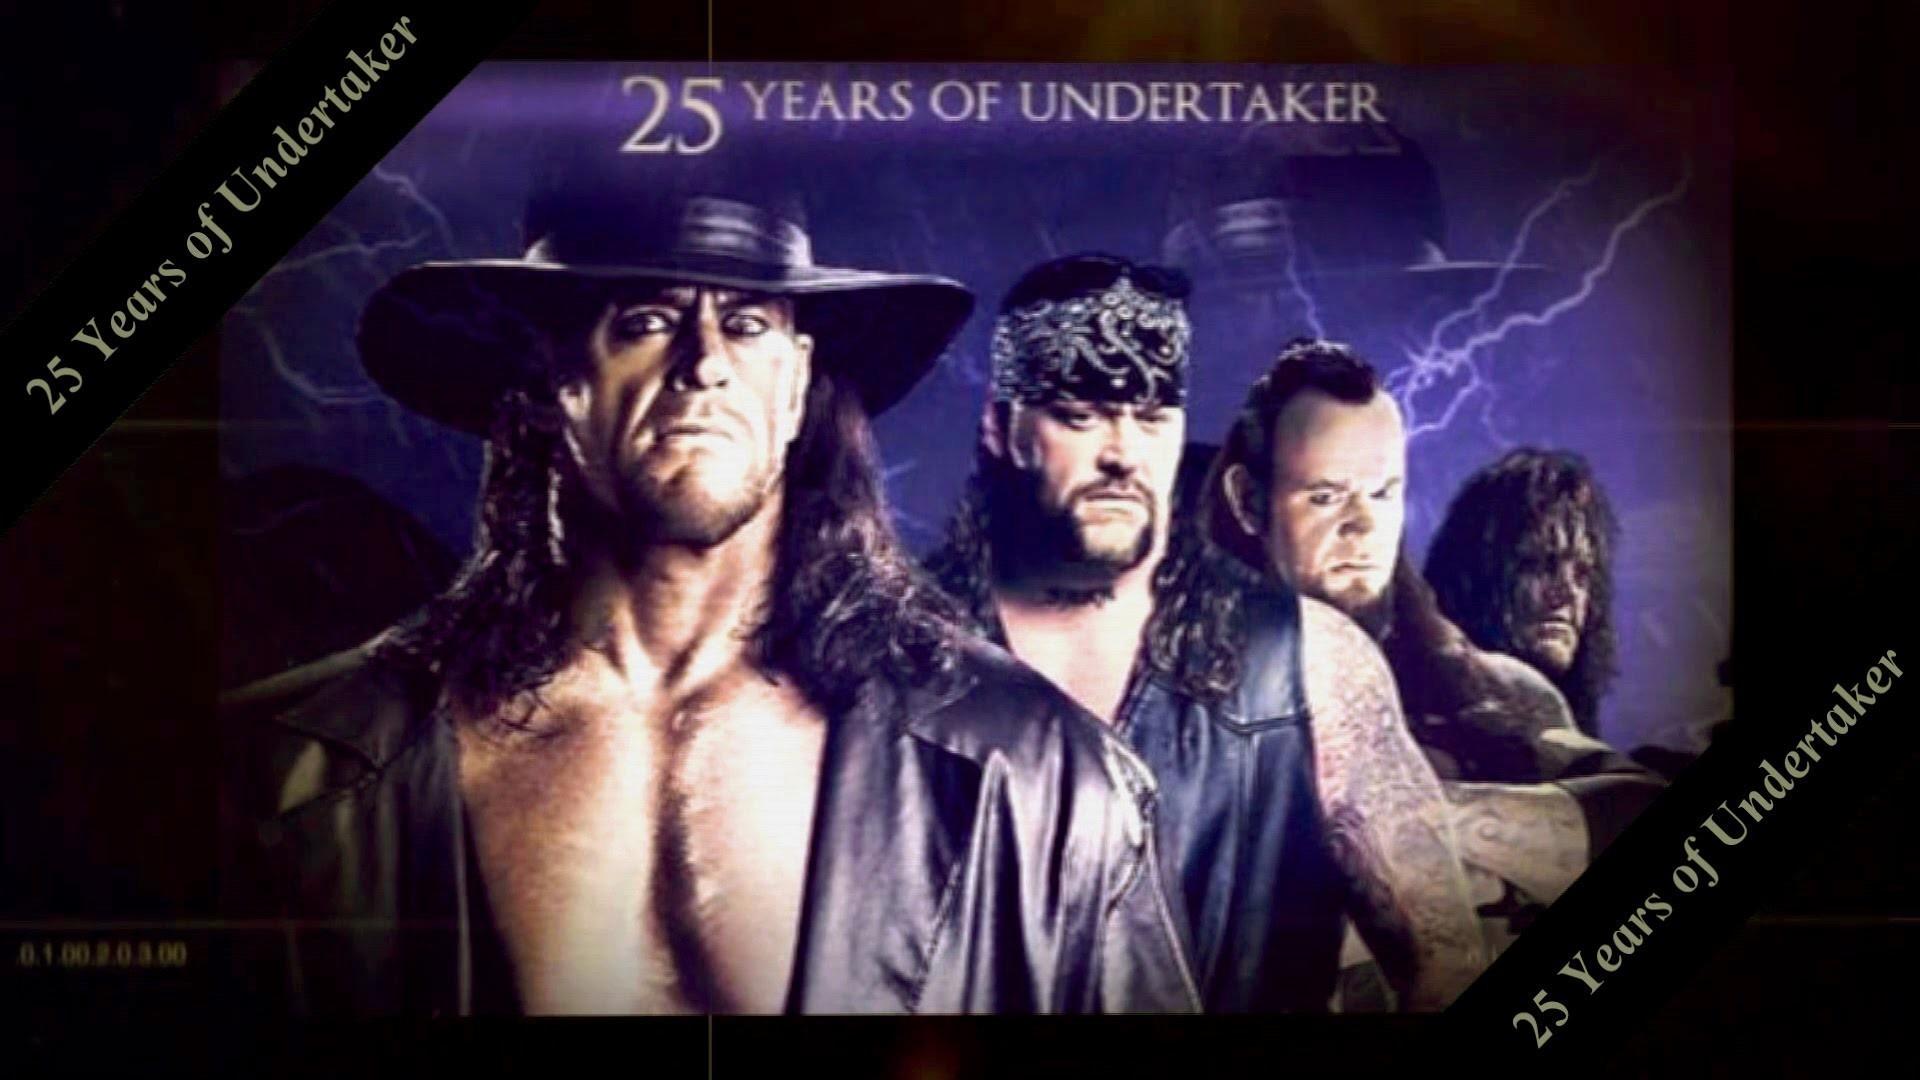 Undertaker wallpaper 2018 hd 1920x1080 1920x1080 undertaker wallpapers hd 2012 undertaker wallpapers 2012 voltagebd Images